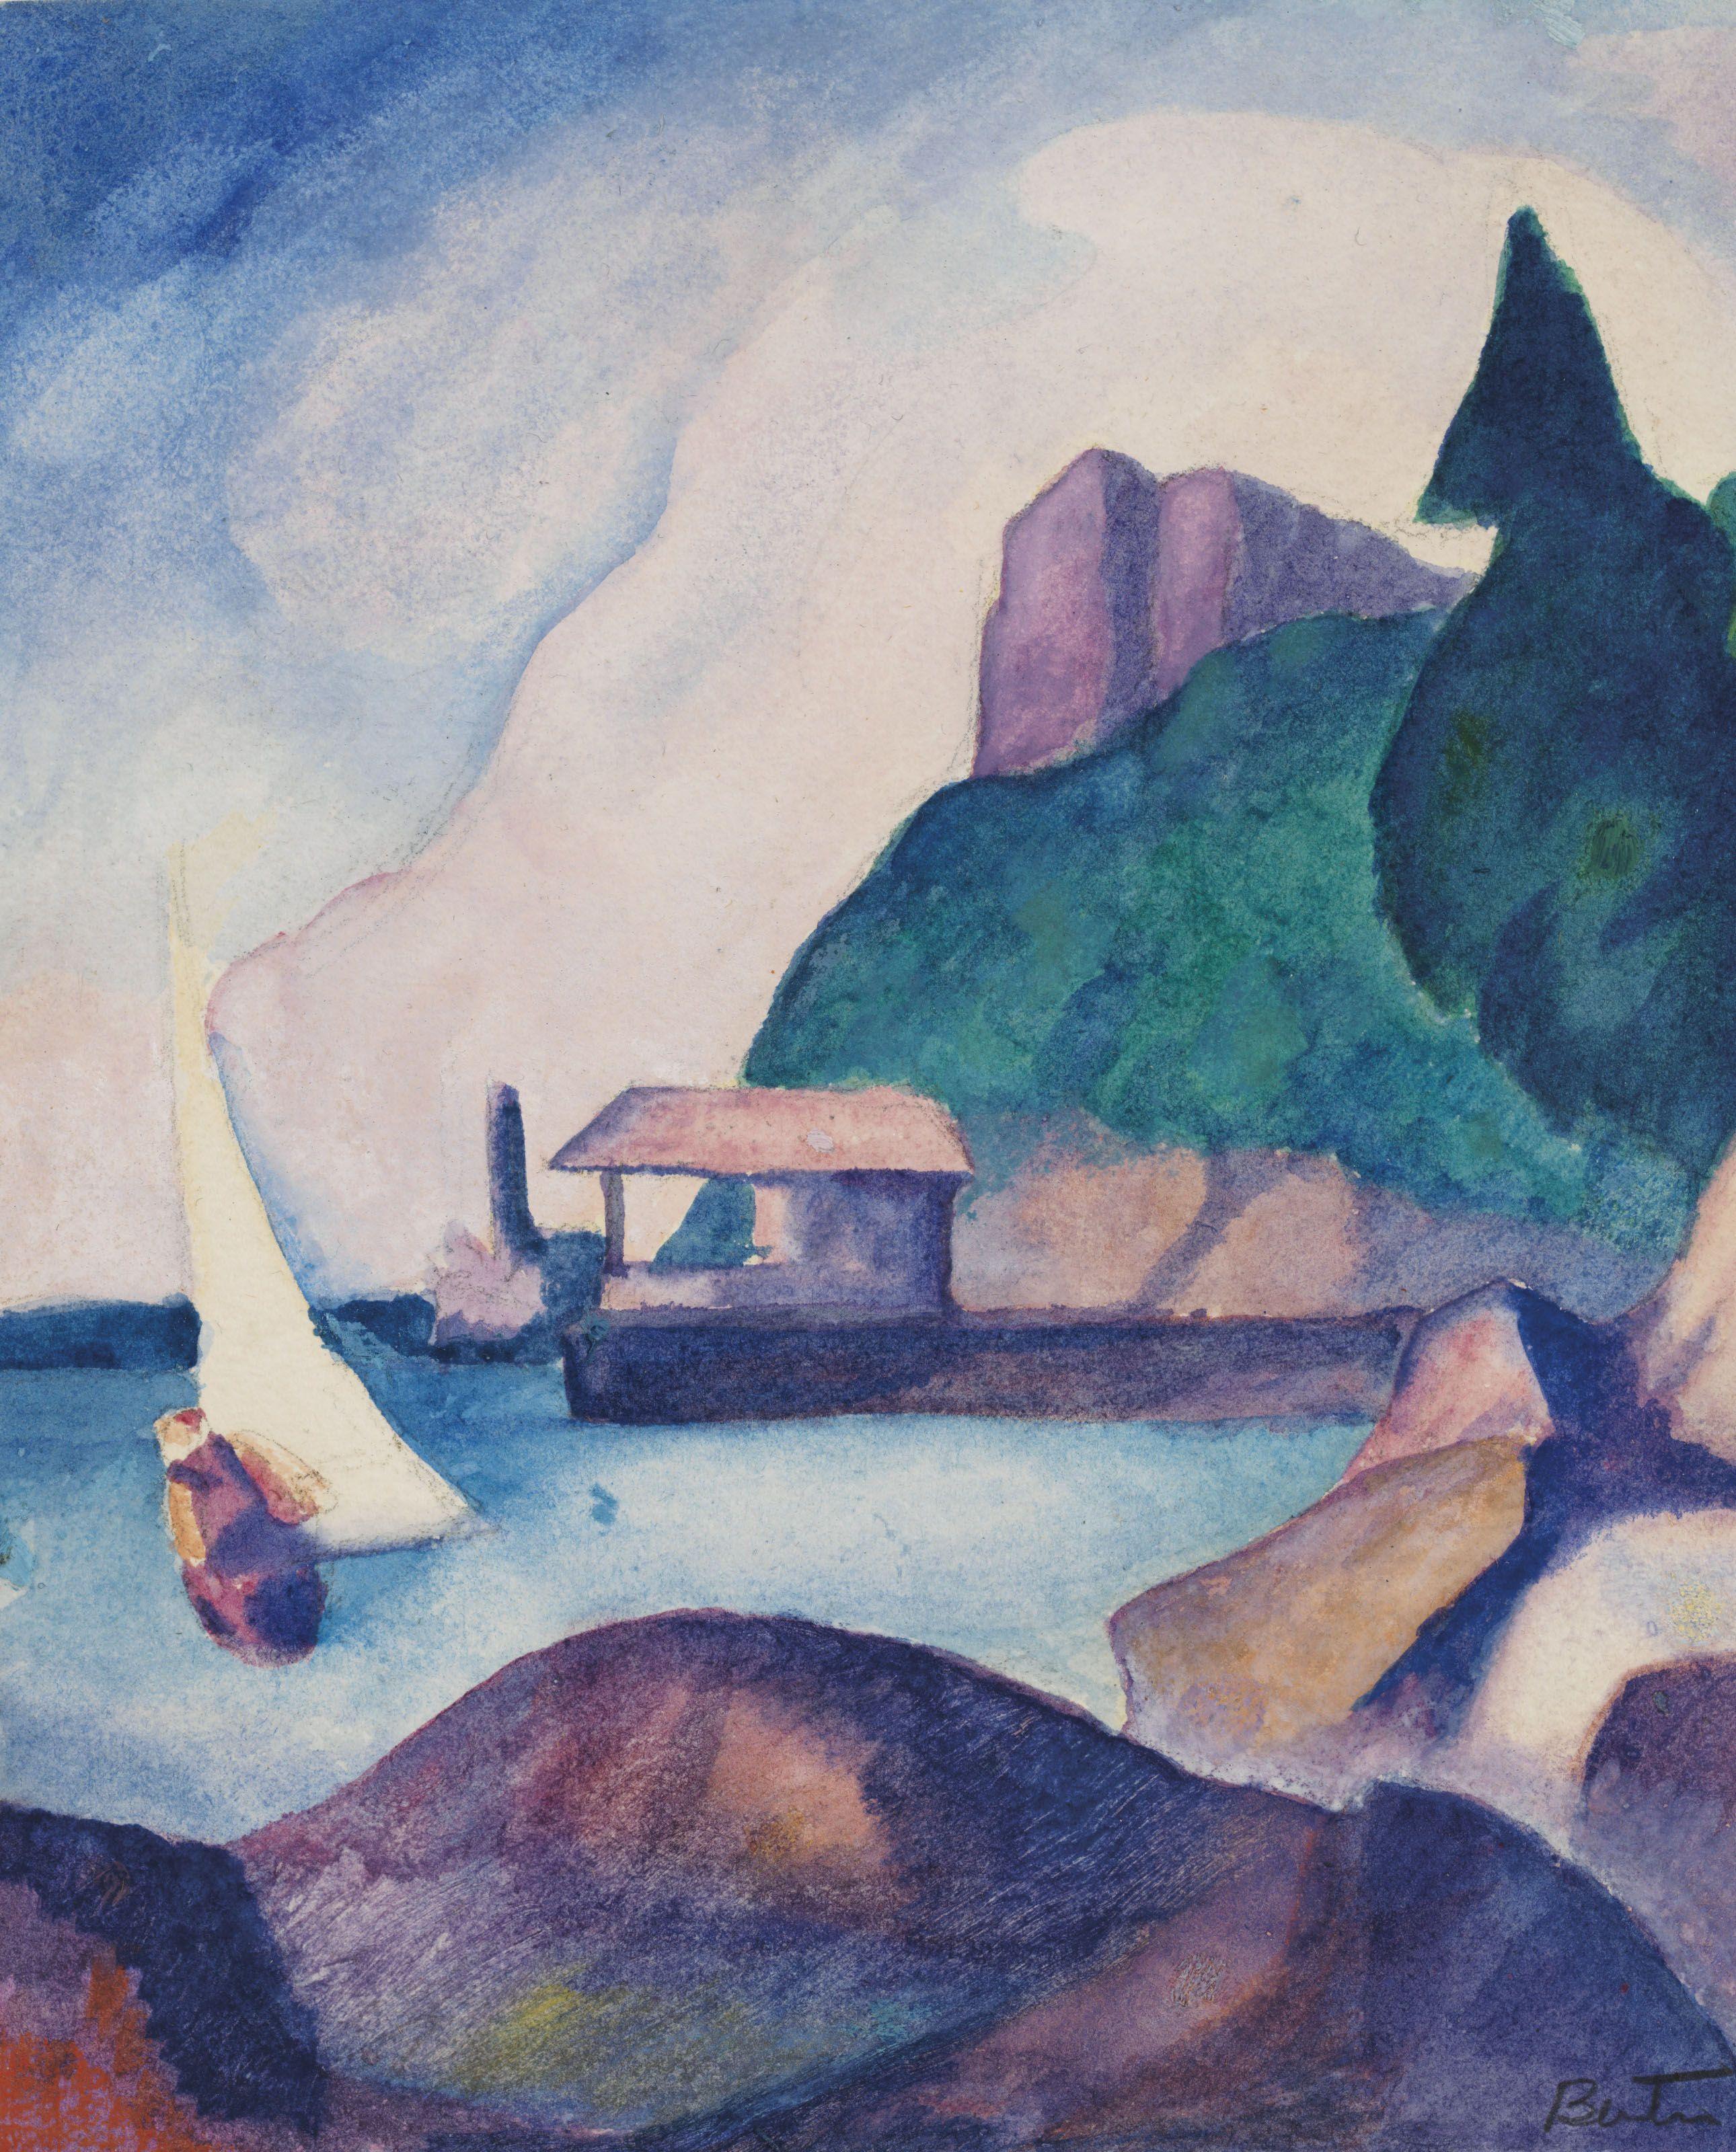 Thomas Hart Benton 1889 1975 Thomas Hart Benton Artist Painting